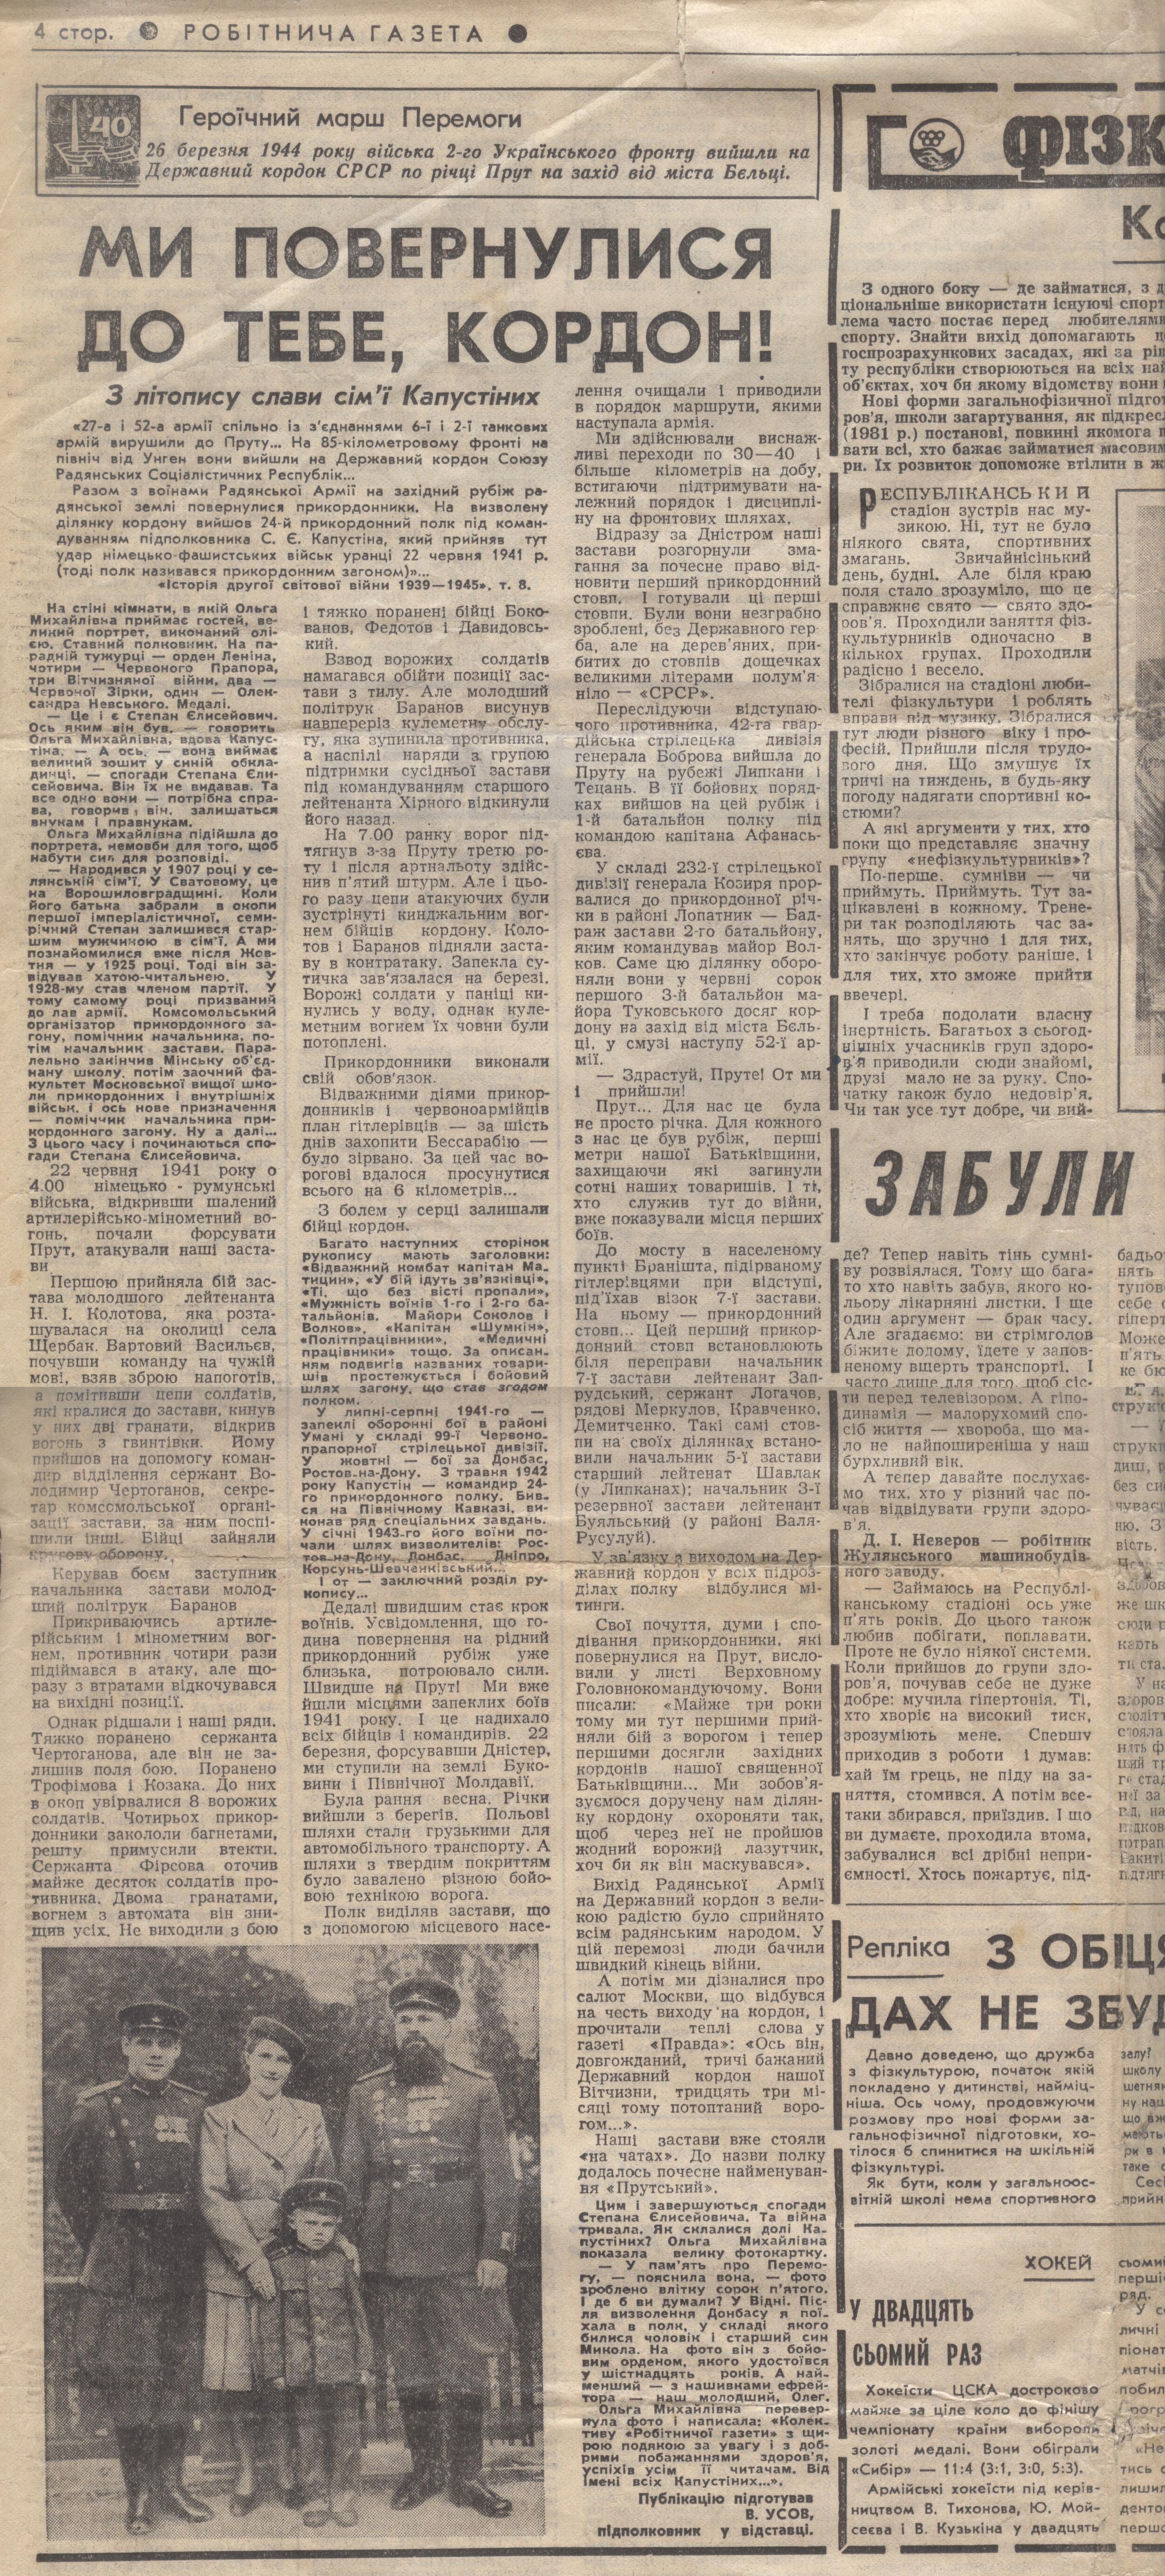 Газета «Робітнича газета» от 27 марта 1984 года - Страница 1